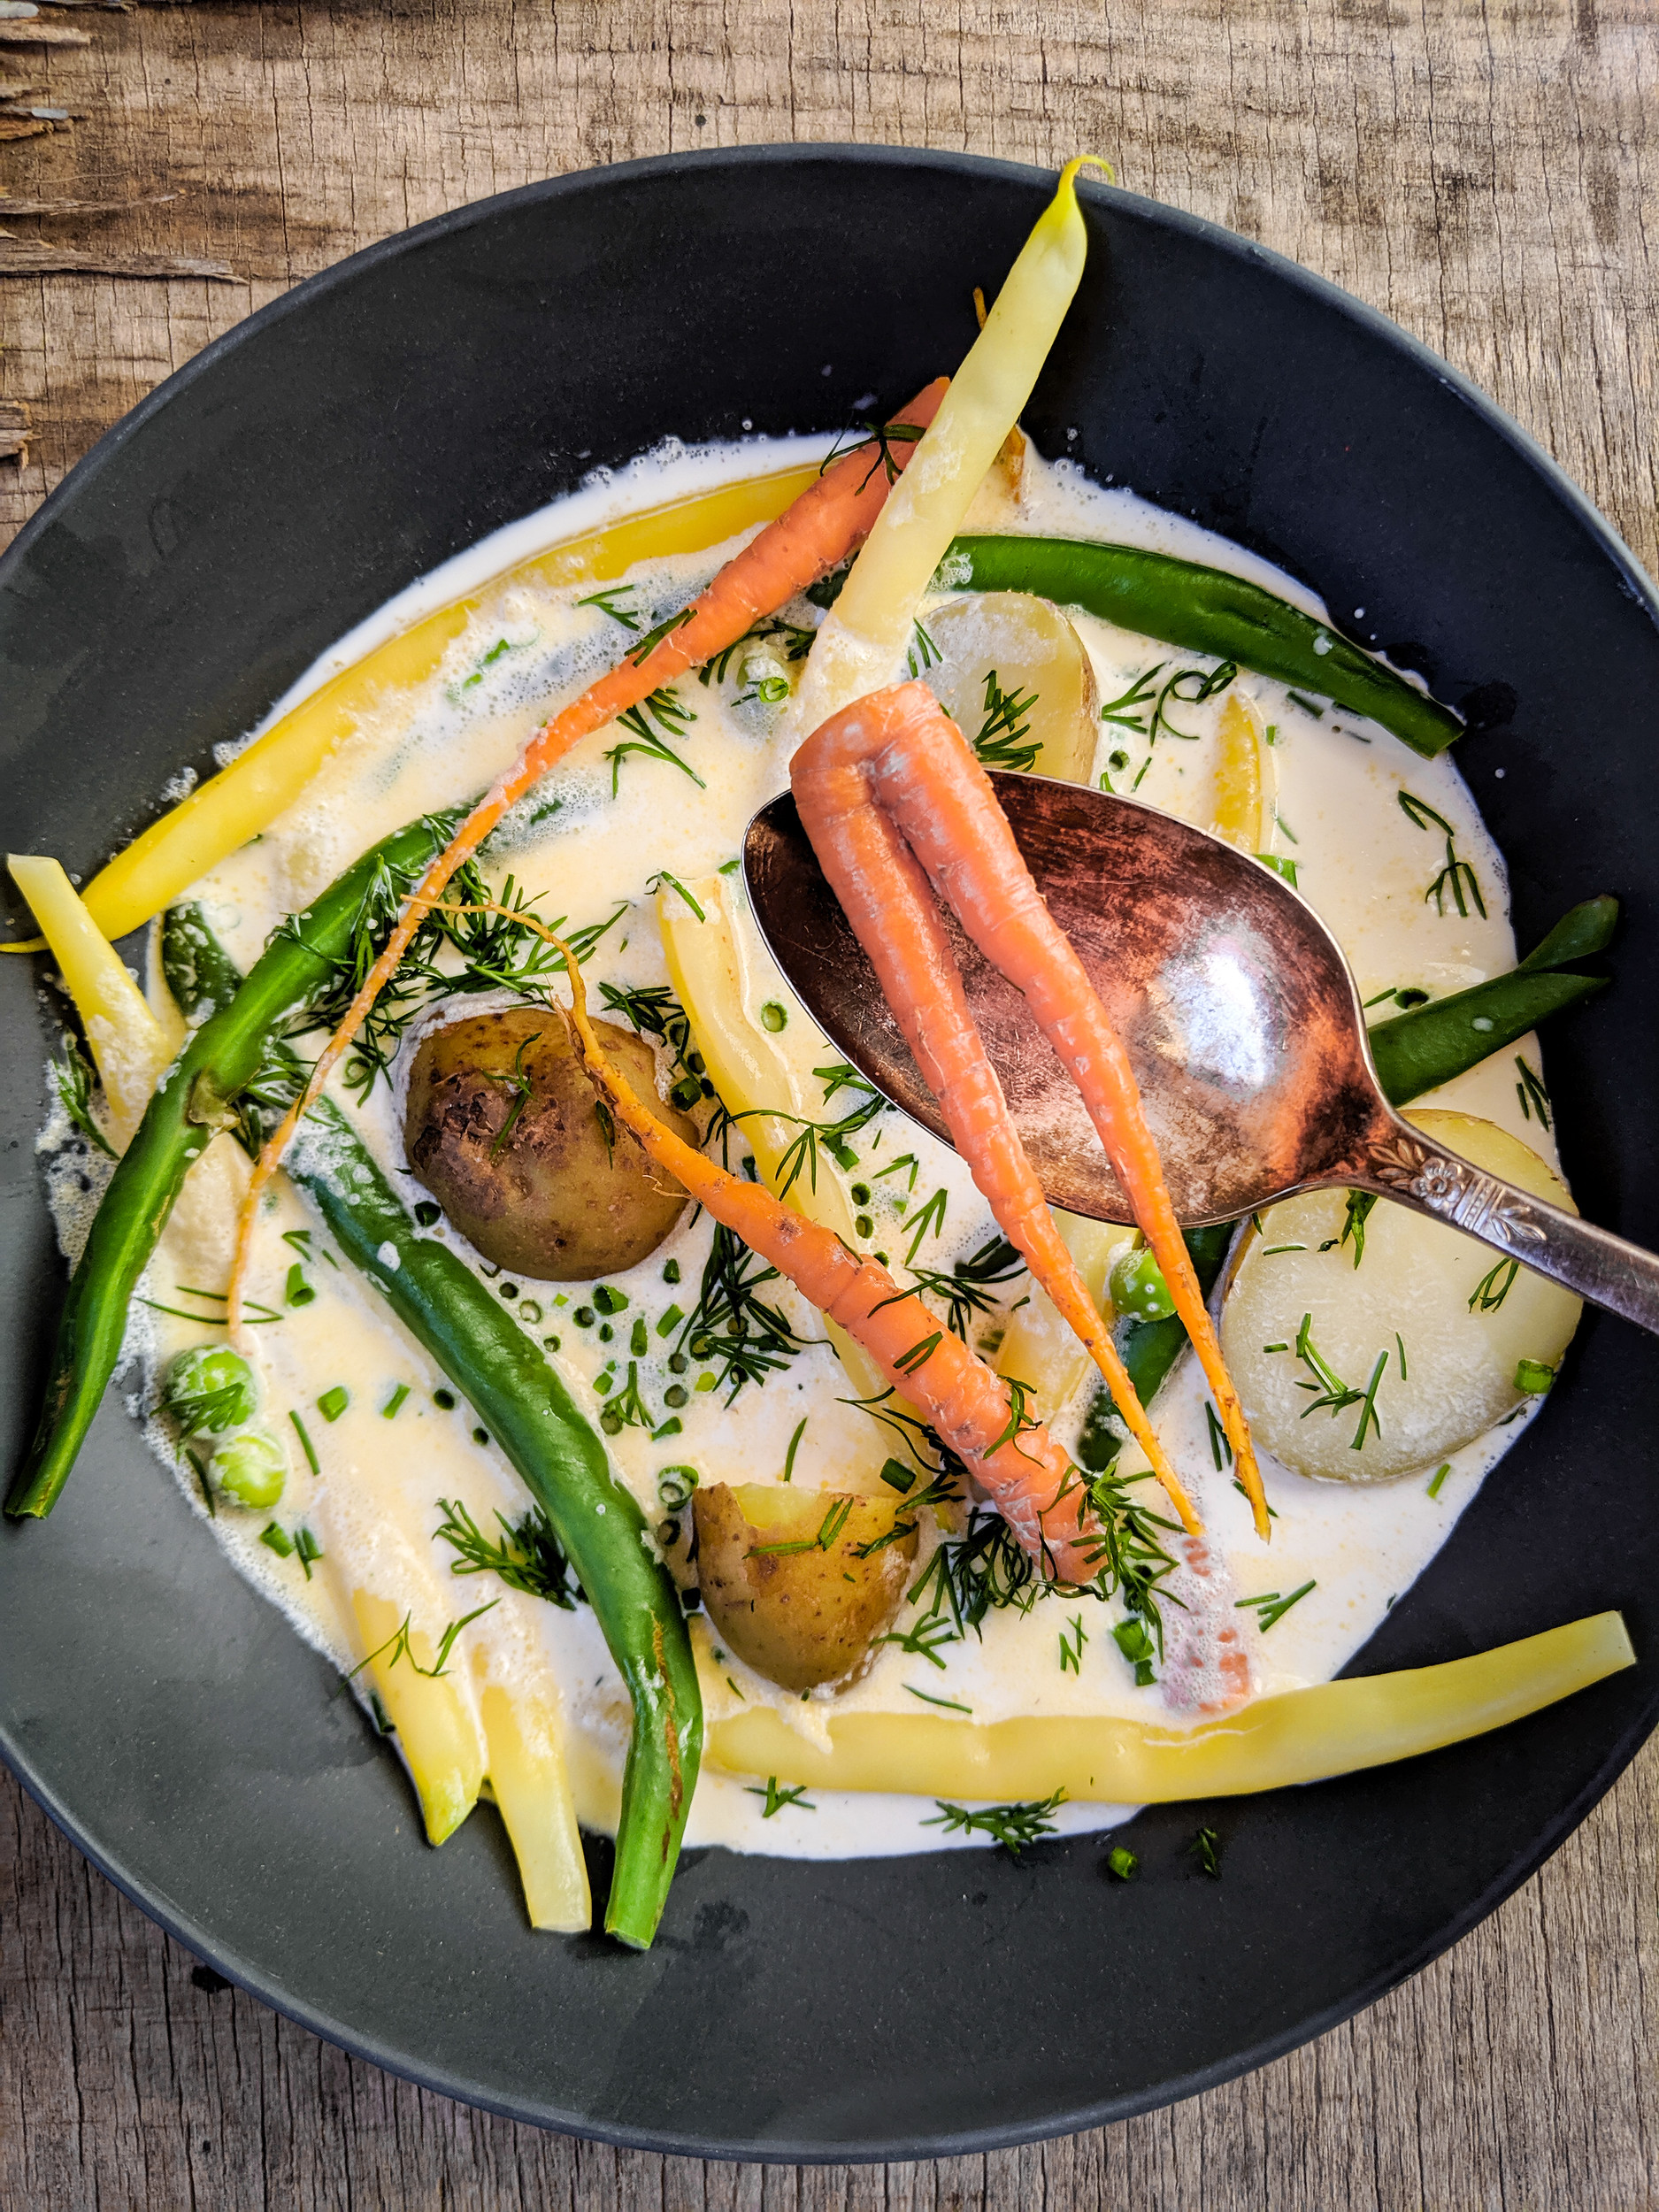 East Coast hodge podge, fresh vegetables in cream.